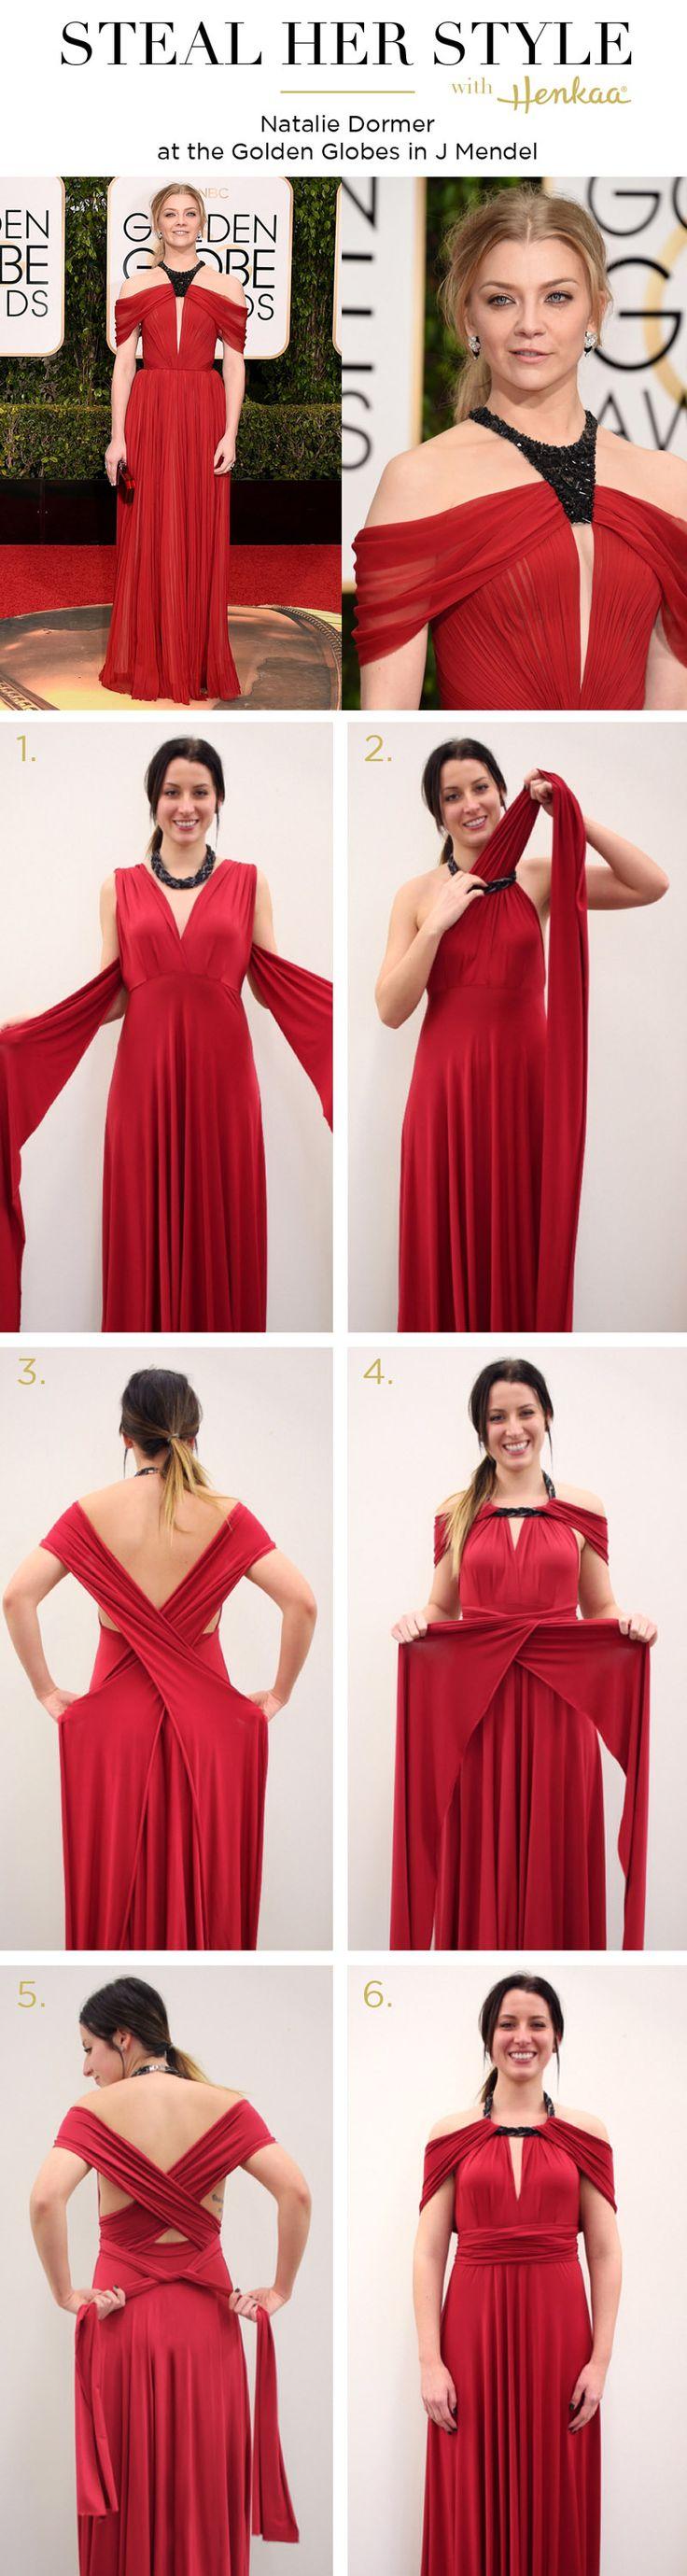 Roubar seu estilo: Natalie Dormer Globos de Ouro.  Descubra como recriado este olhar para o blog Henkaa!